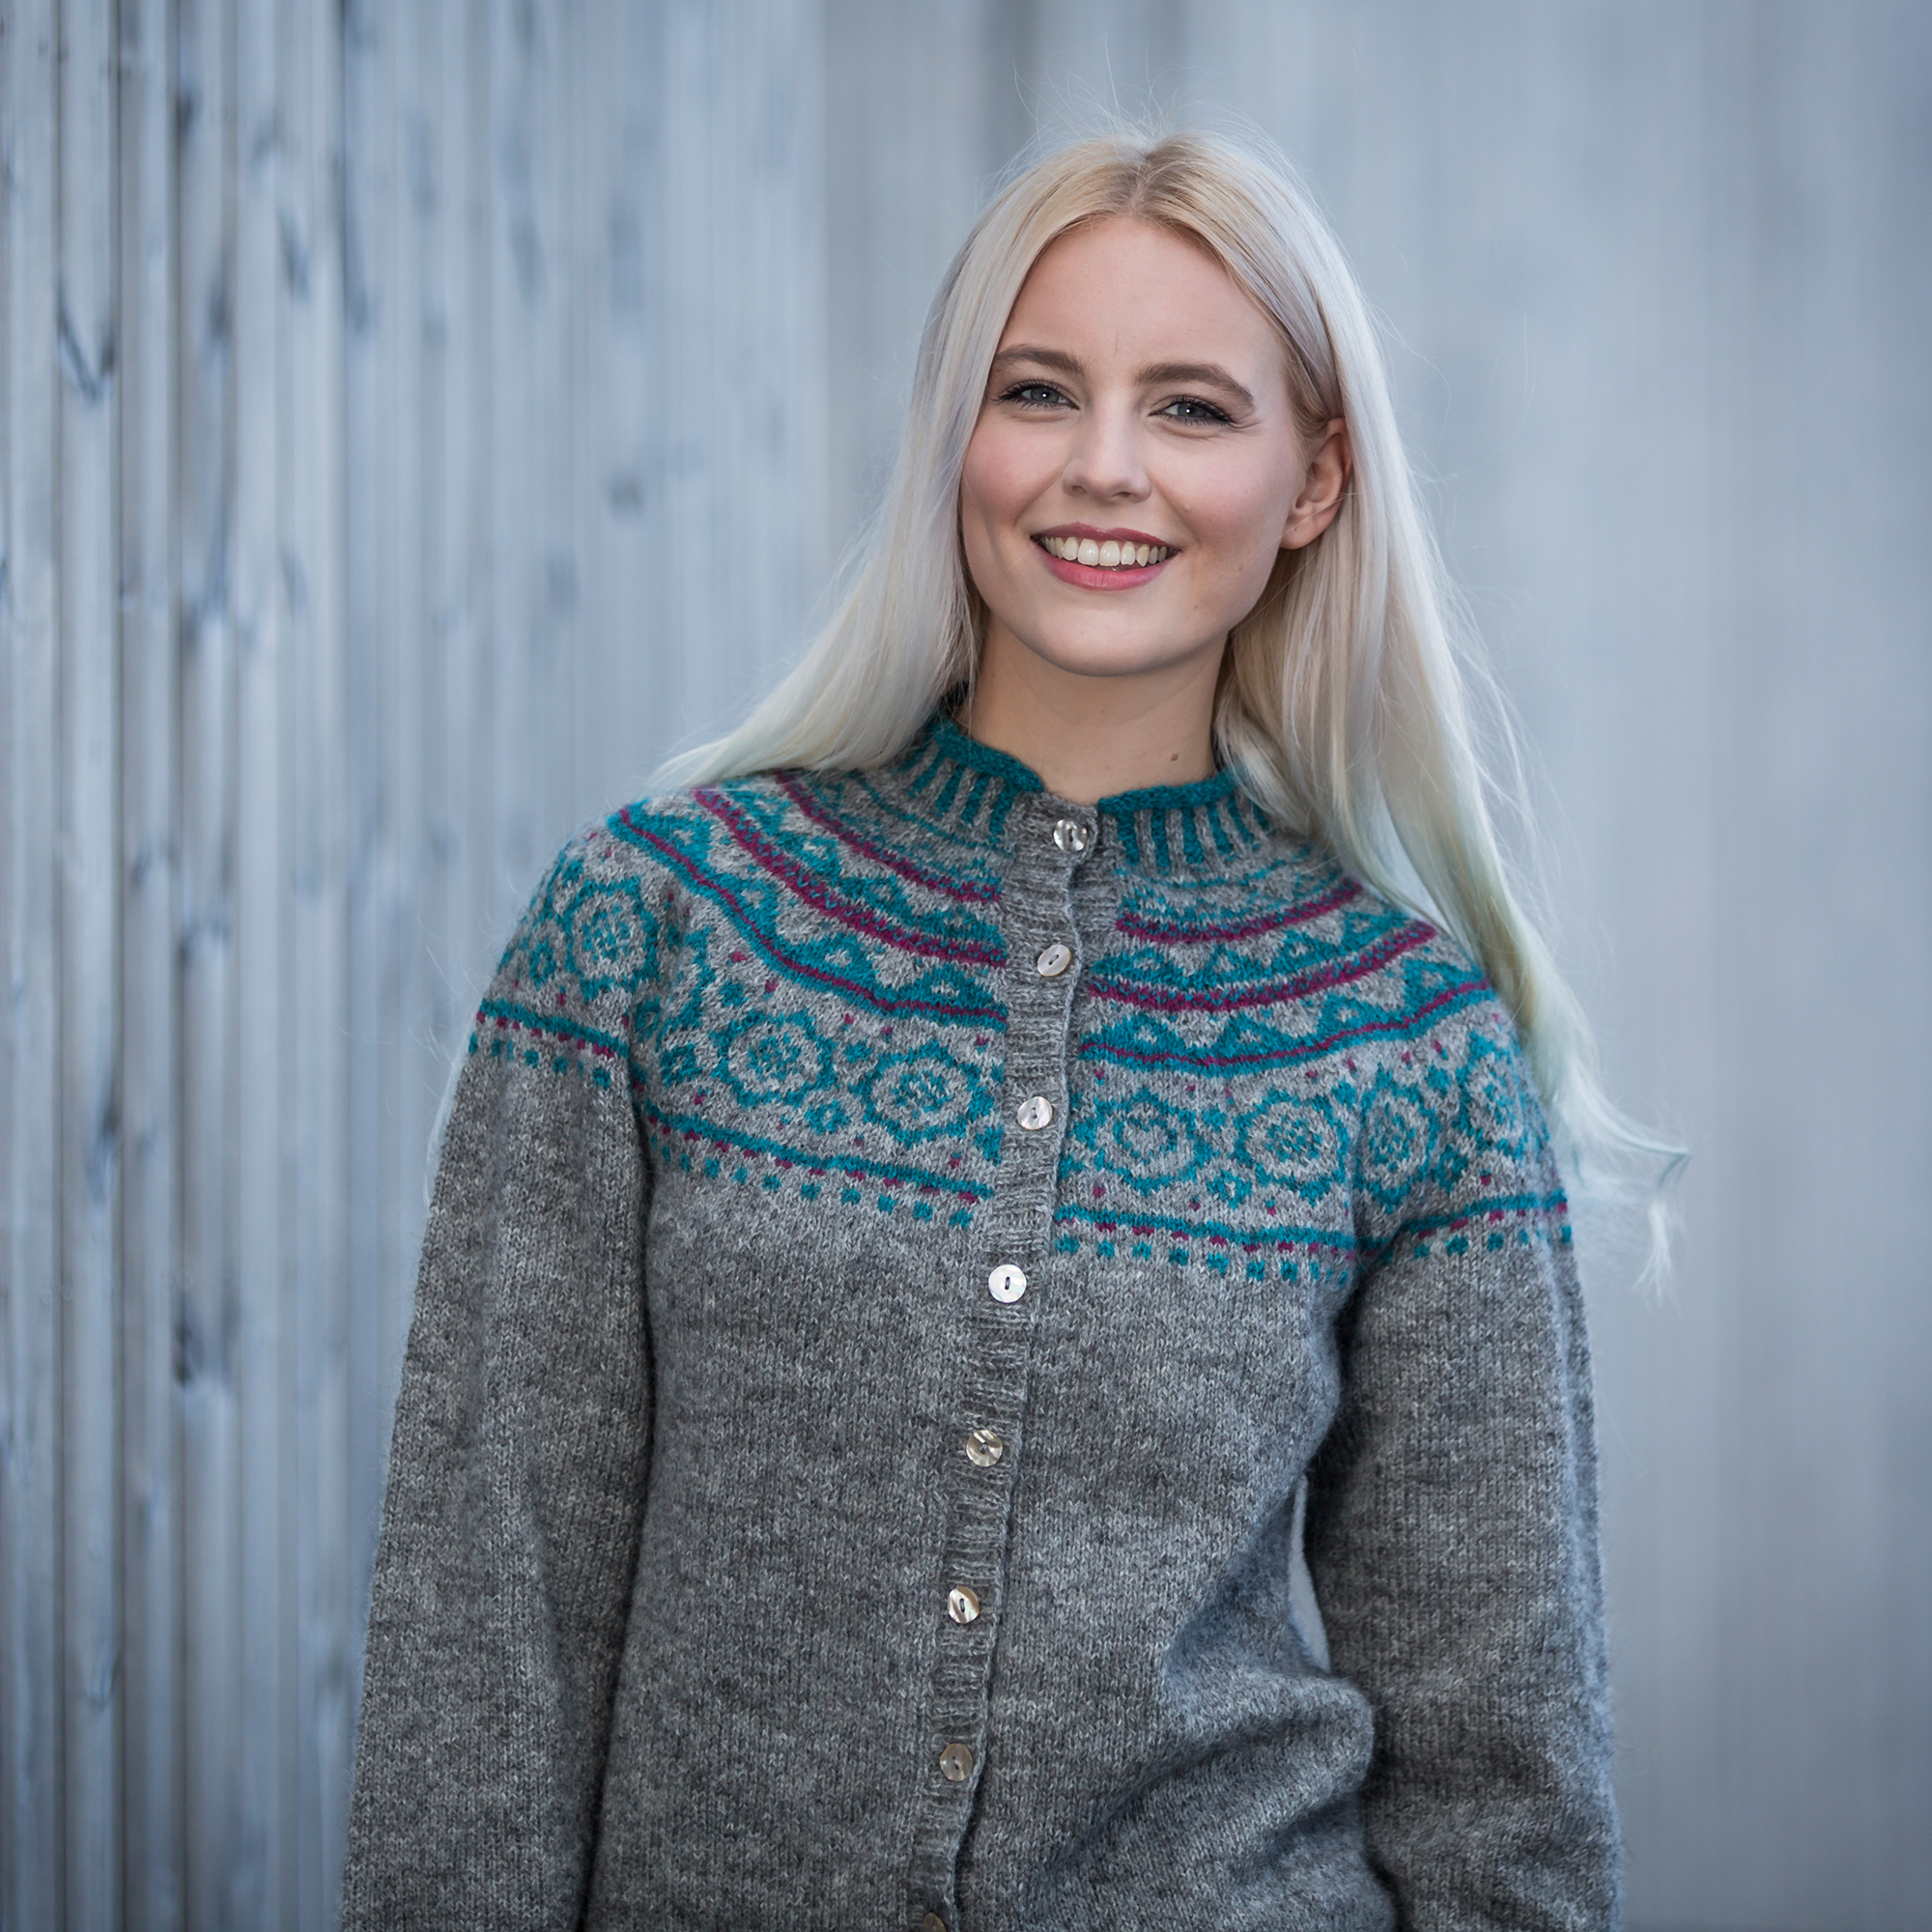 datingside norge norske sexy jenter